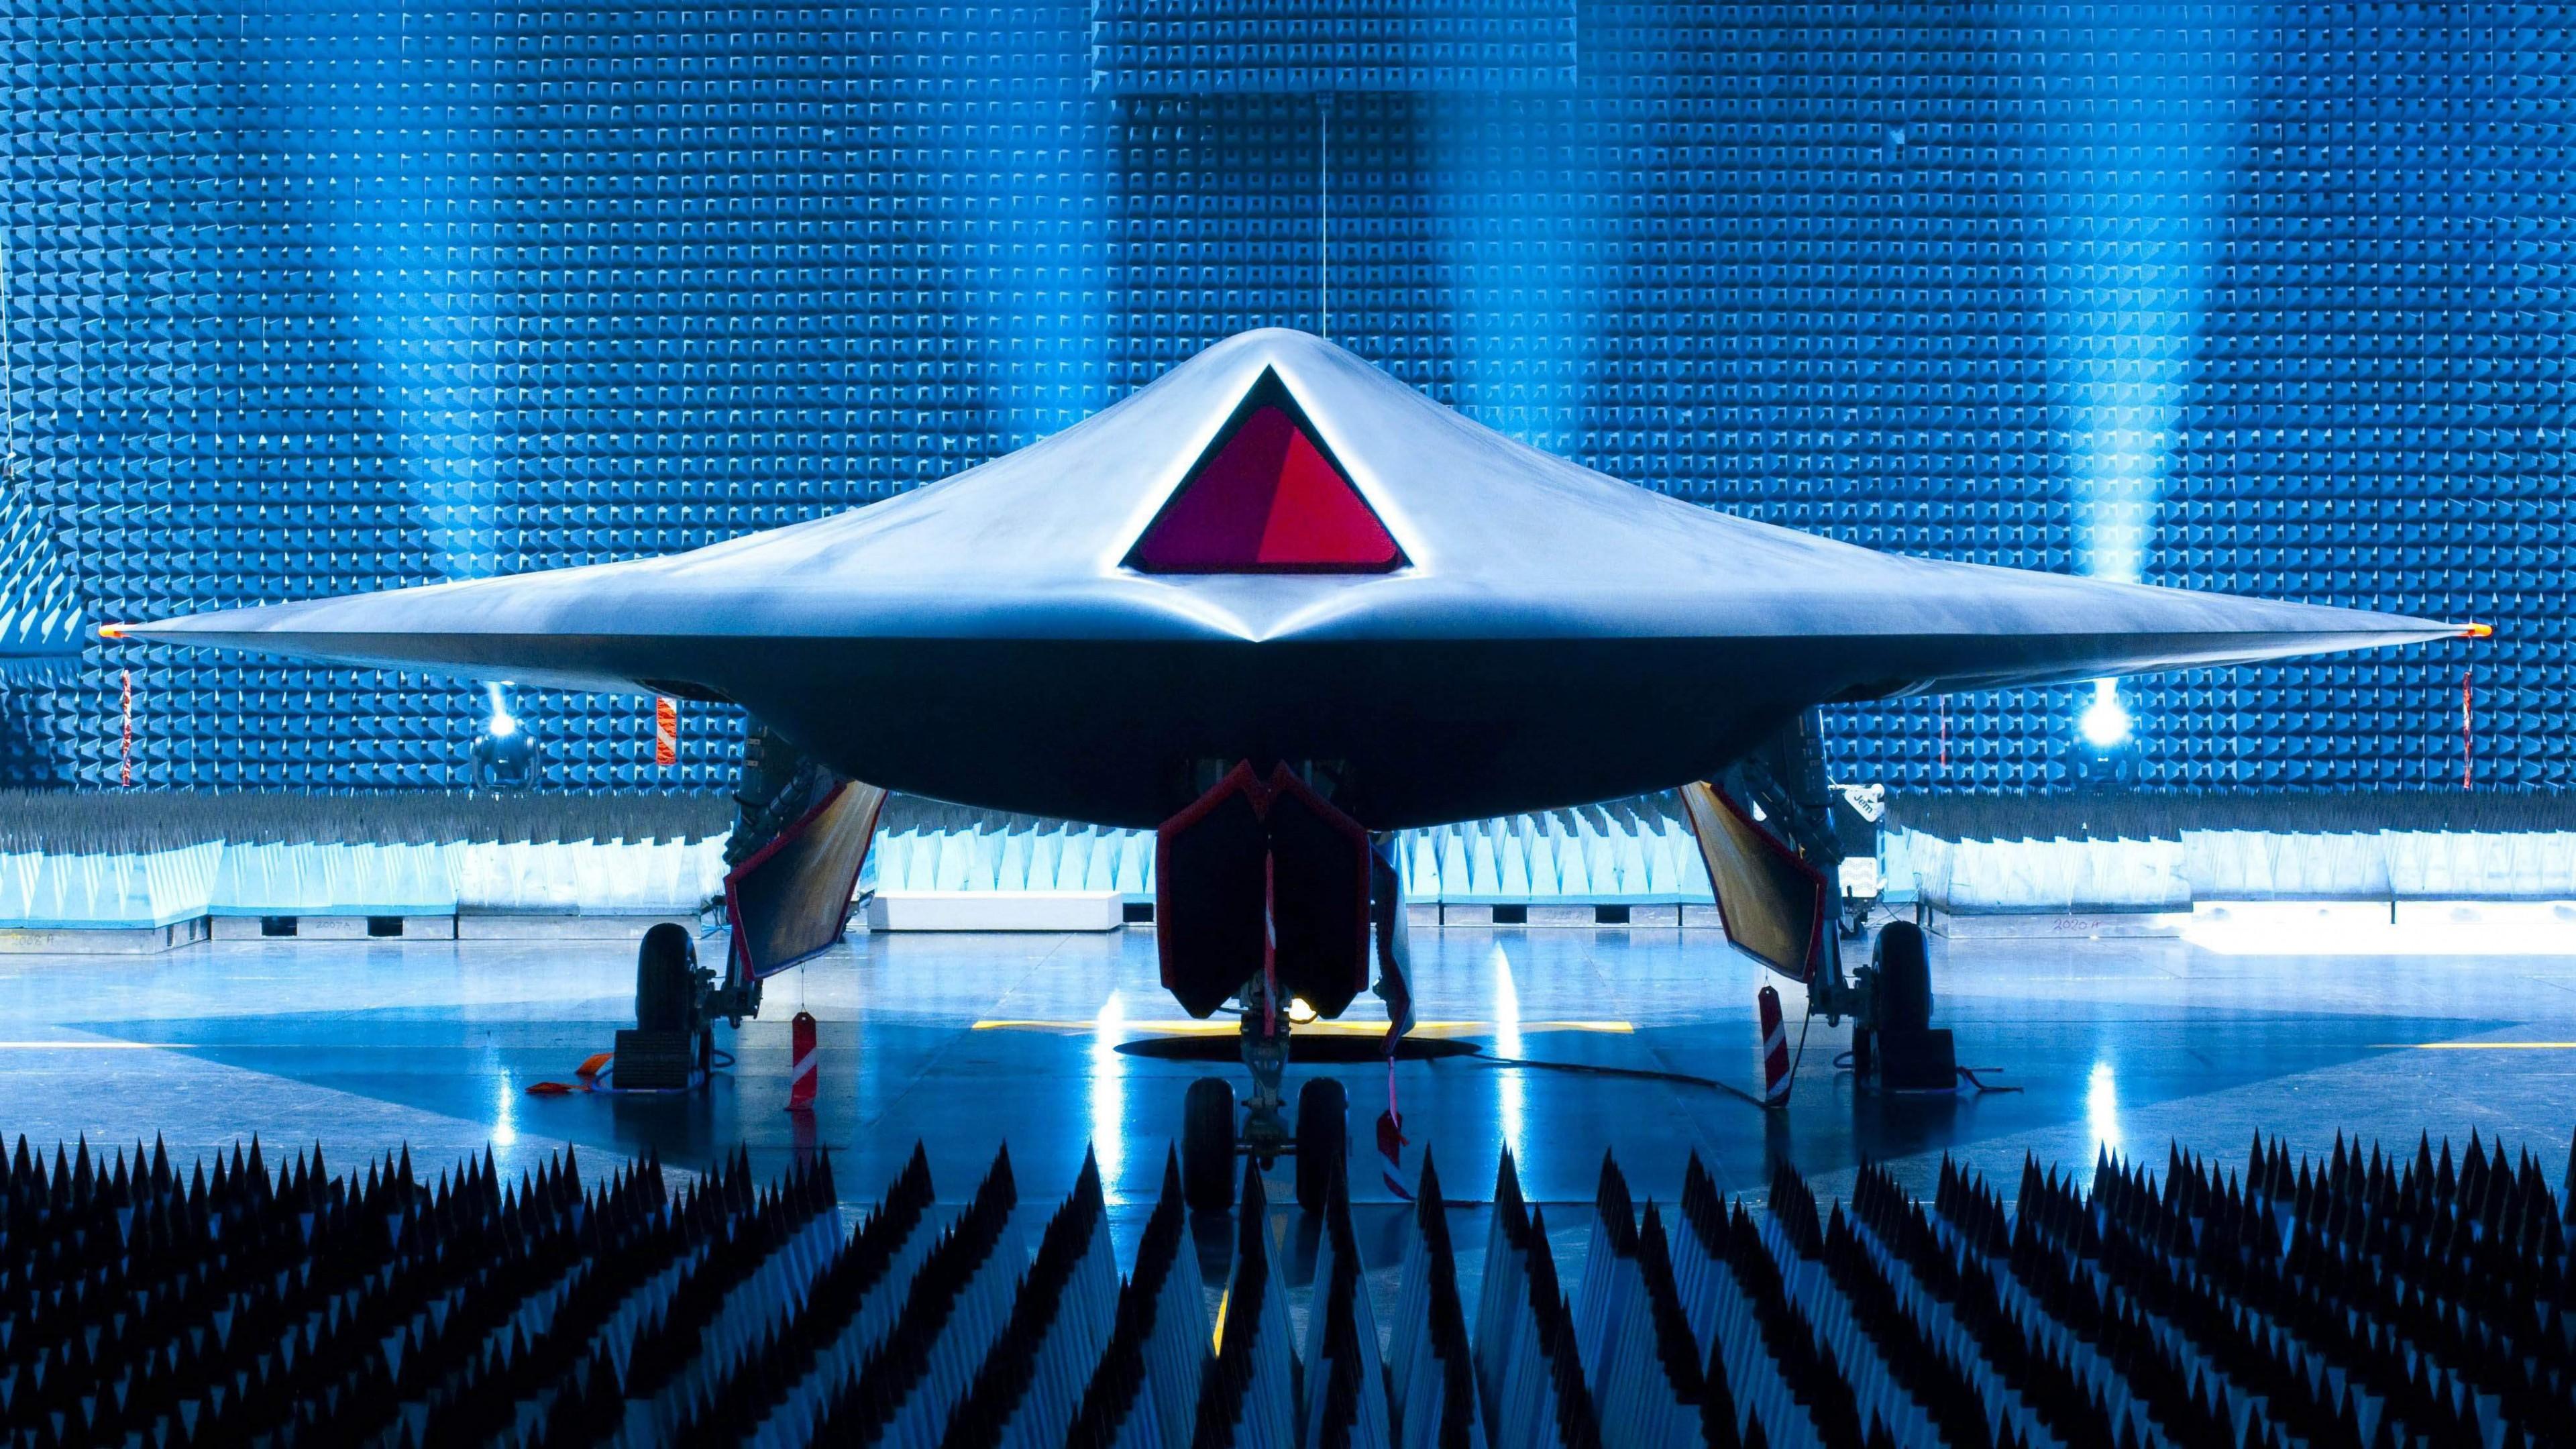 wallpaper taranis  raptor  bae systems  british army  uav  stealth technology  stealth  ucav